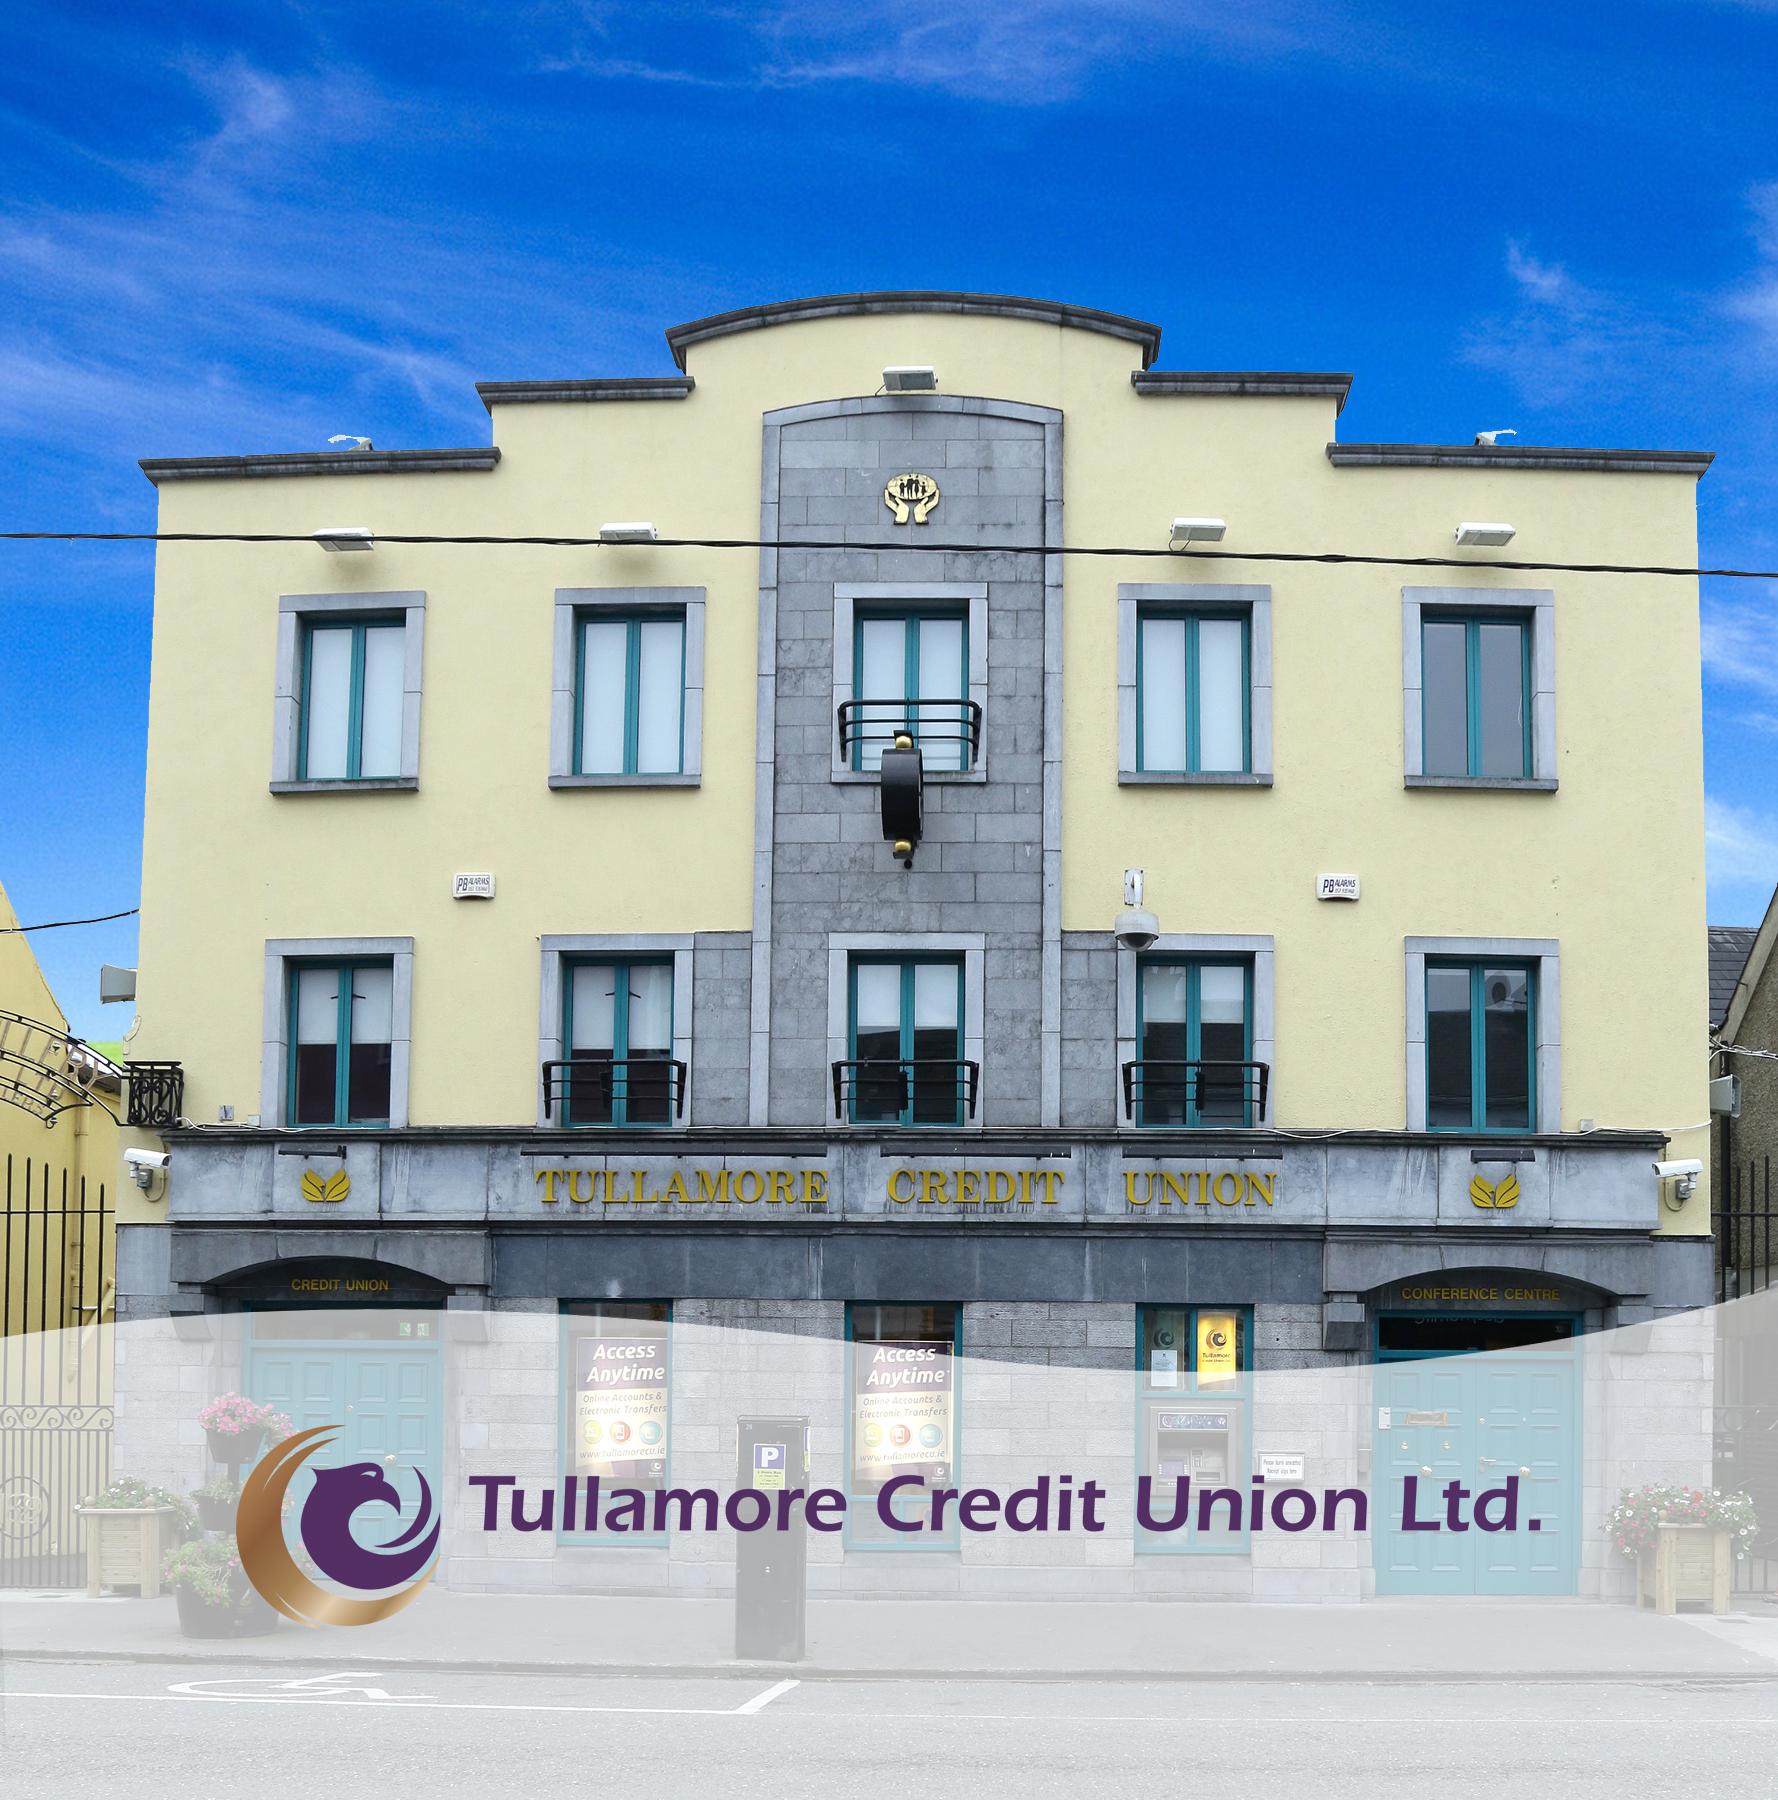 Project Coordinator – Tullamore Credit Union